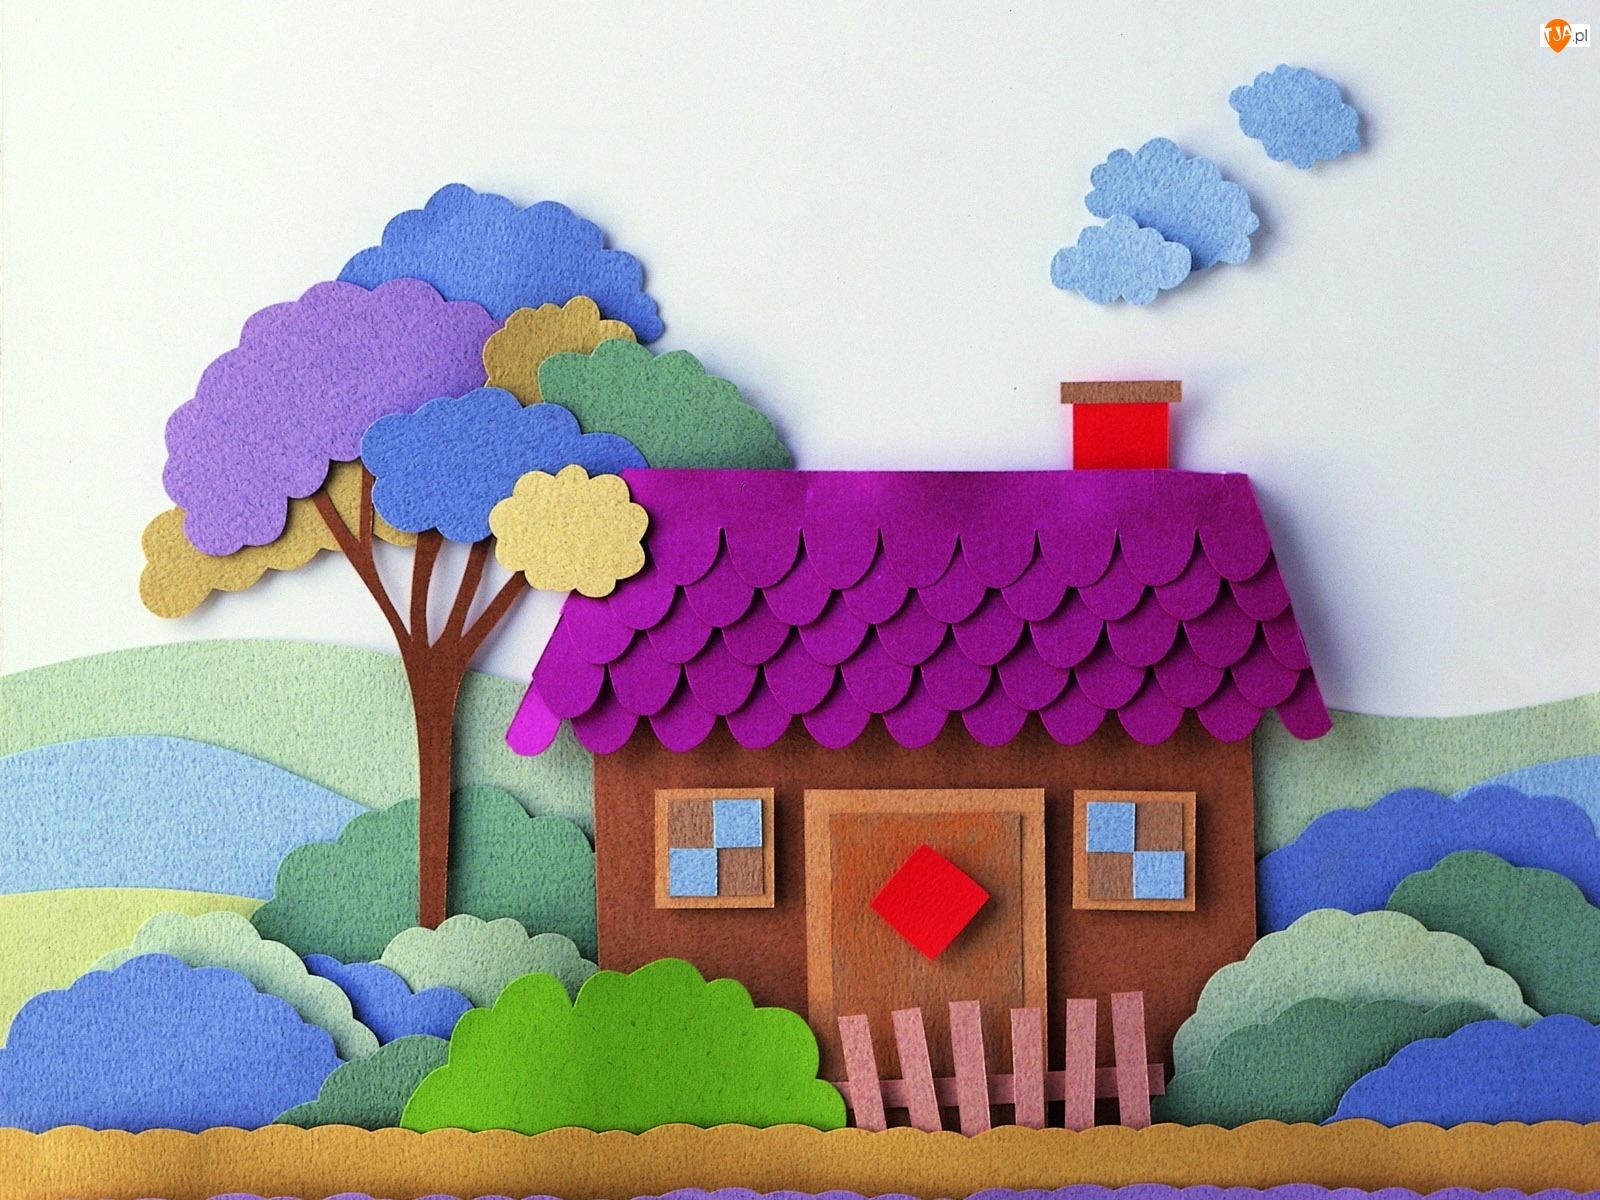 Domek, Papier Art, Drzewo, Krzewy